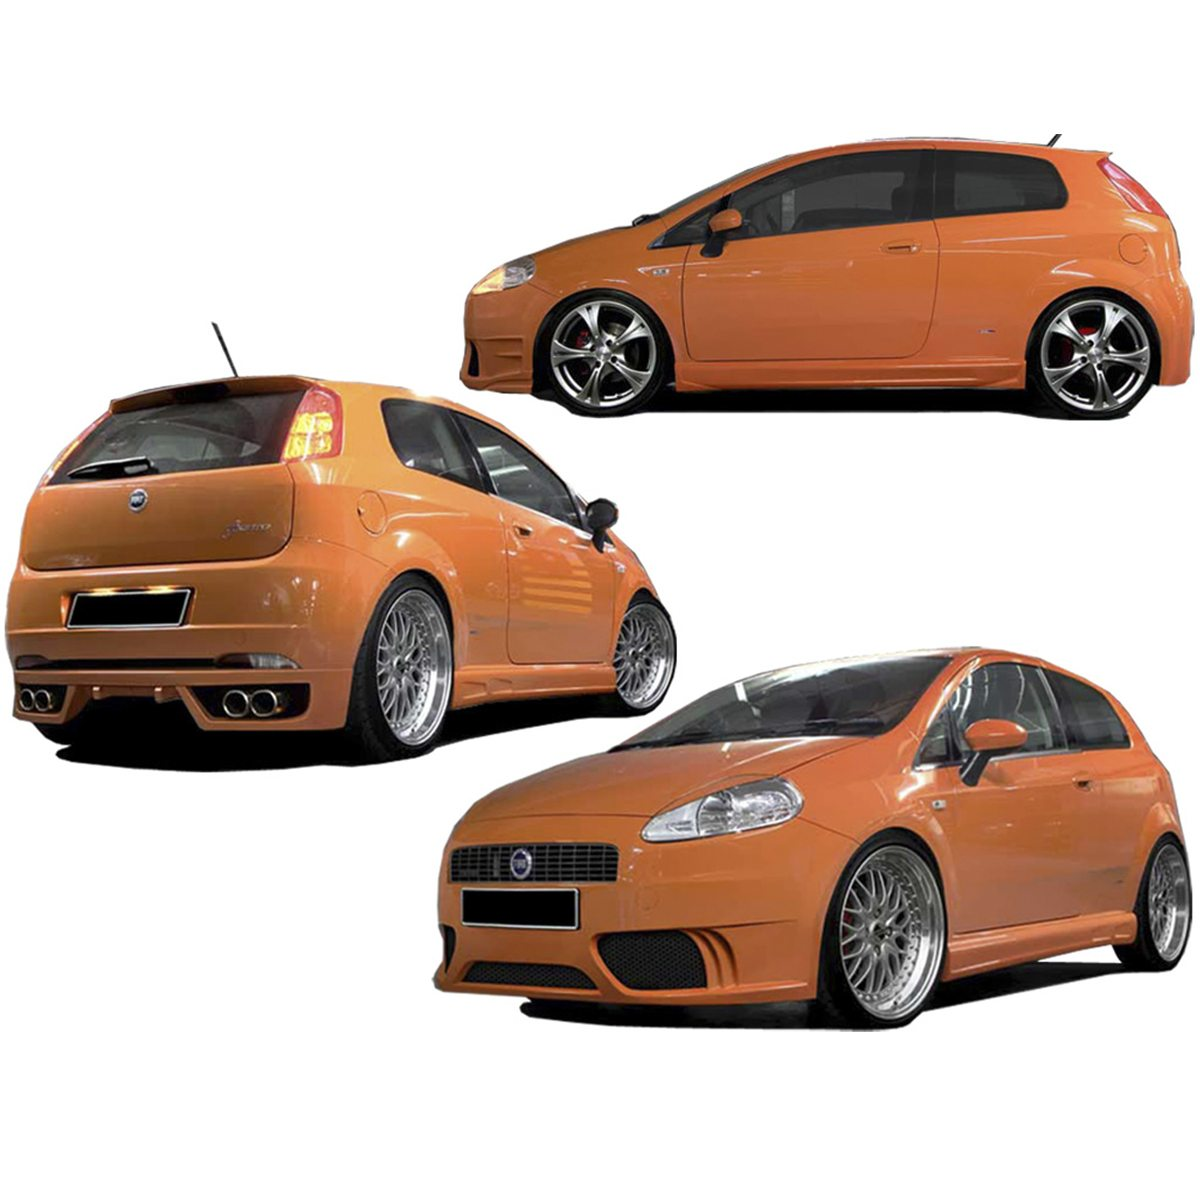 Fiat-Grande-Punto-2005-KIT-KTS030-1